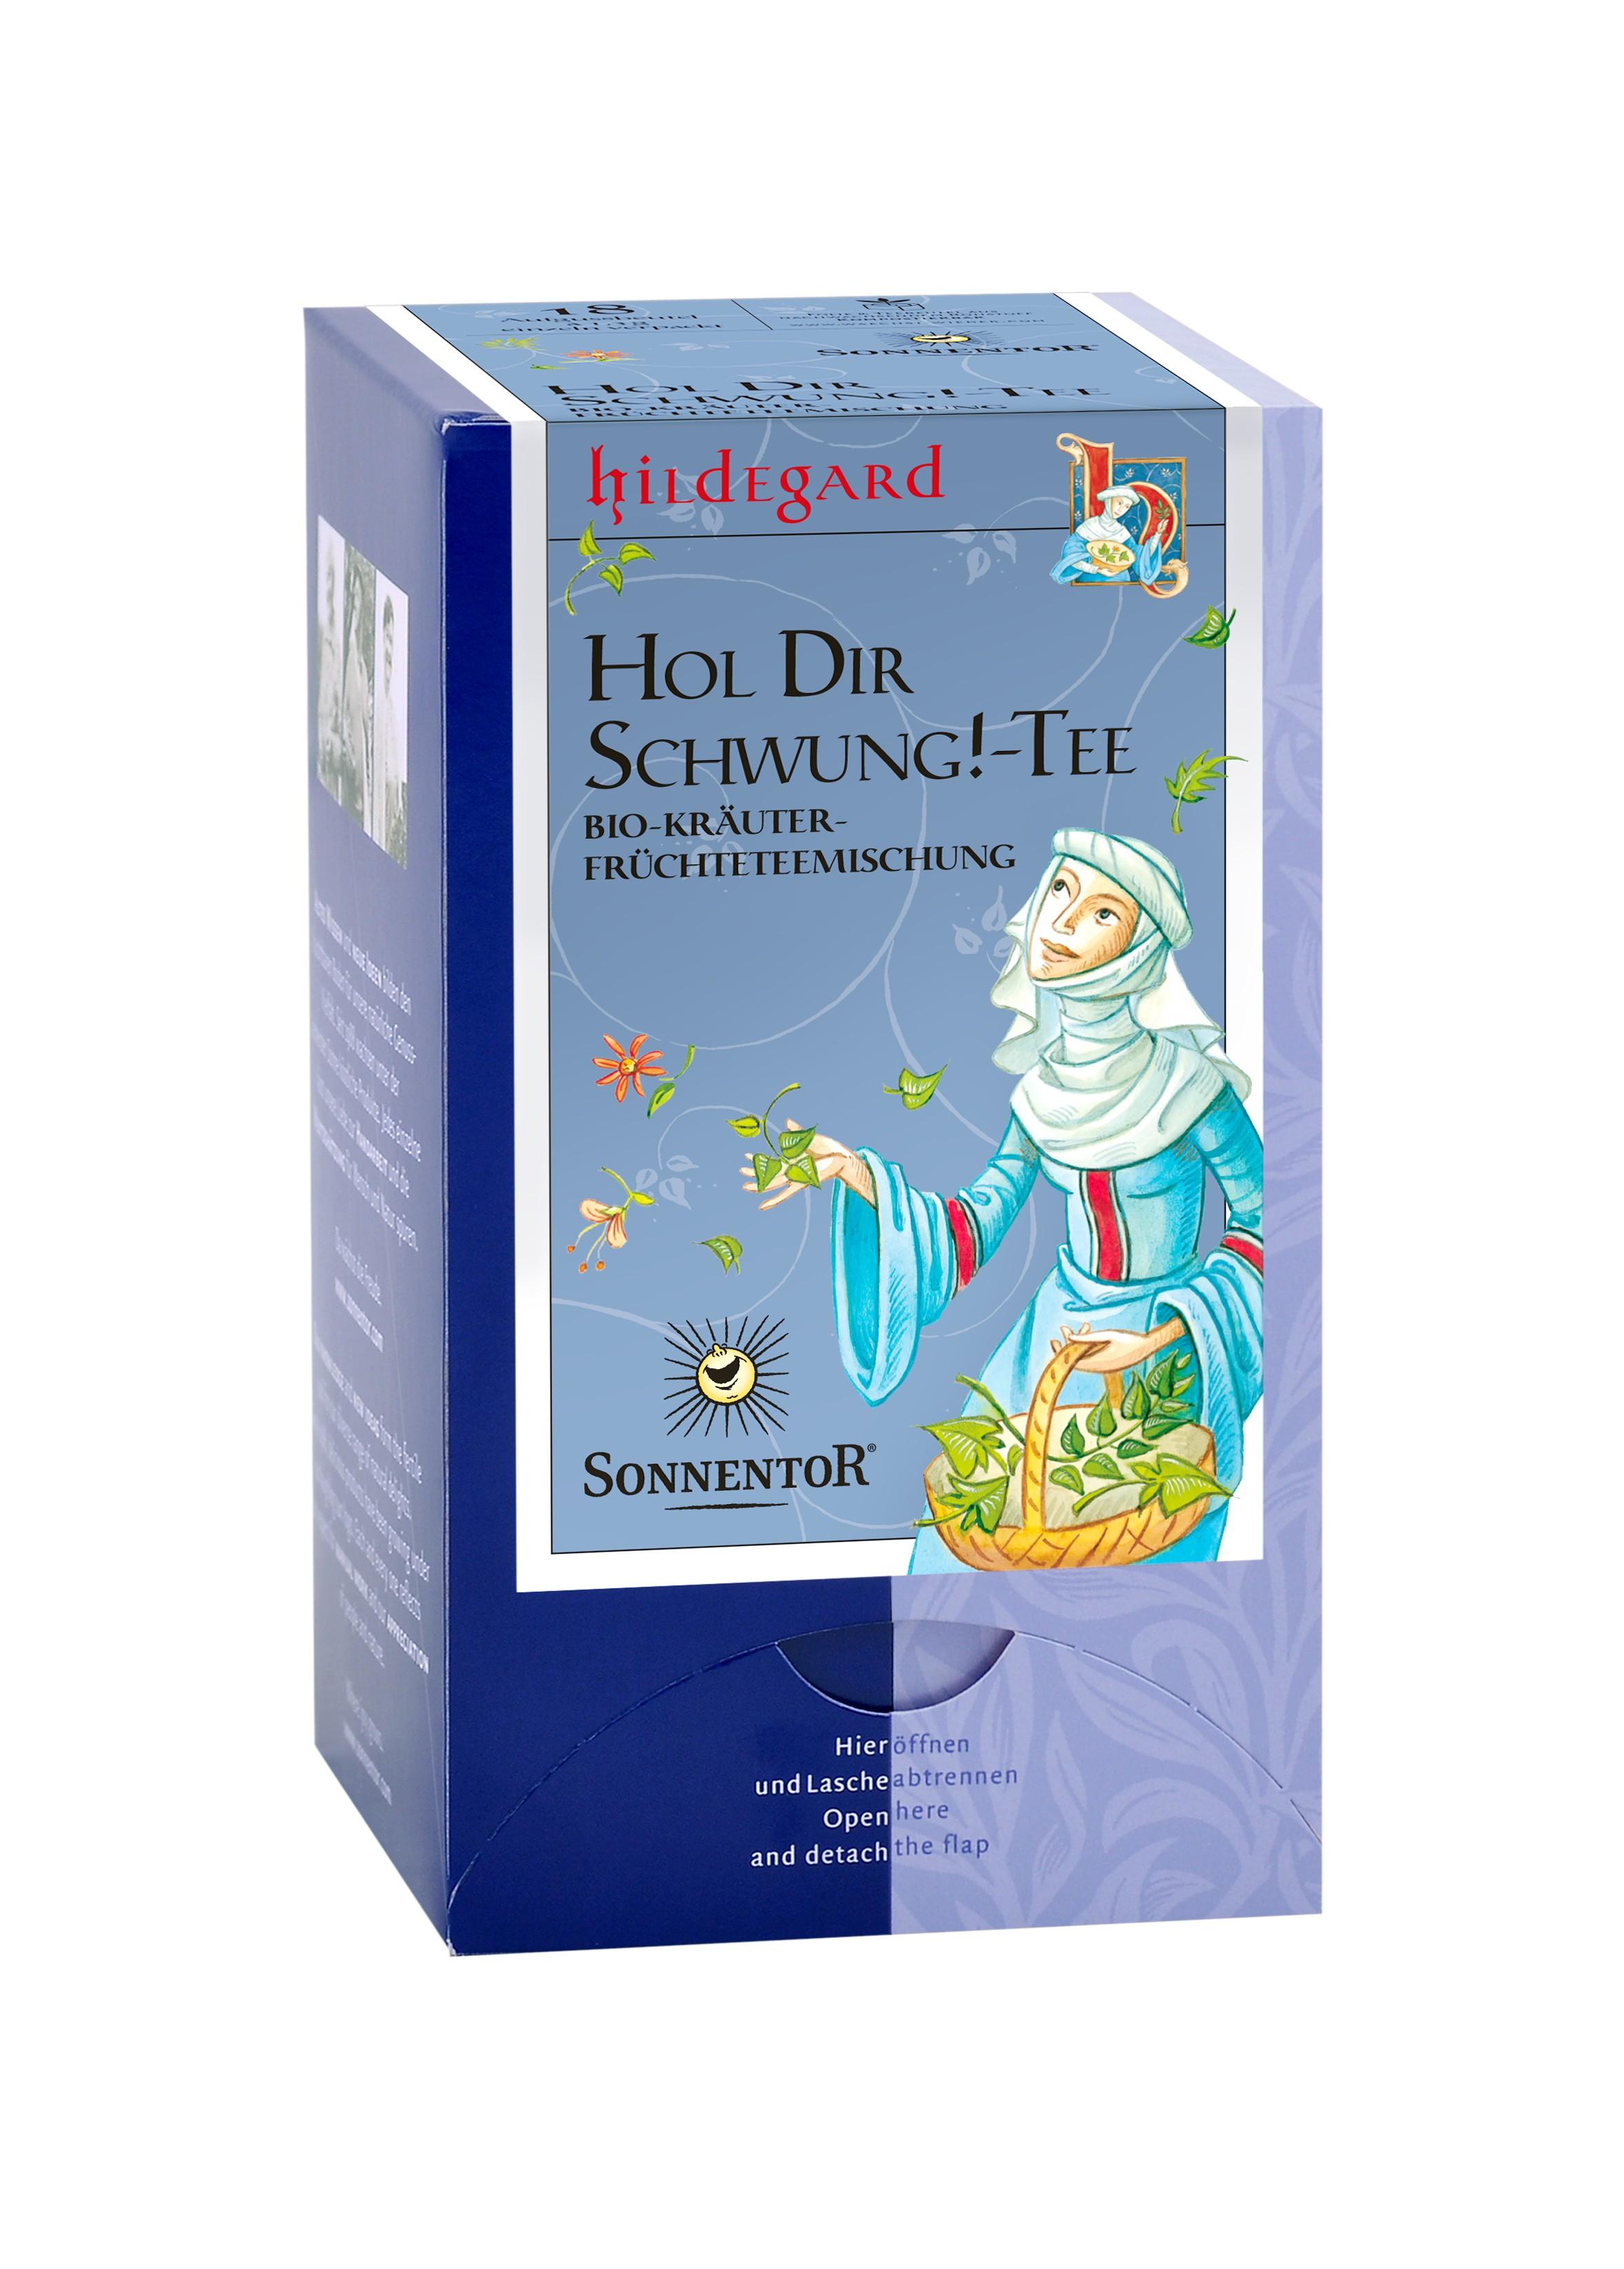 Hol Dir Schwung! Tee Hildegard 23g bio